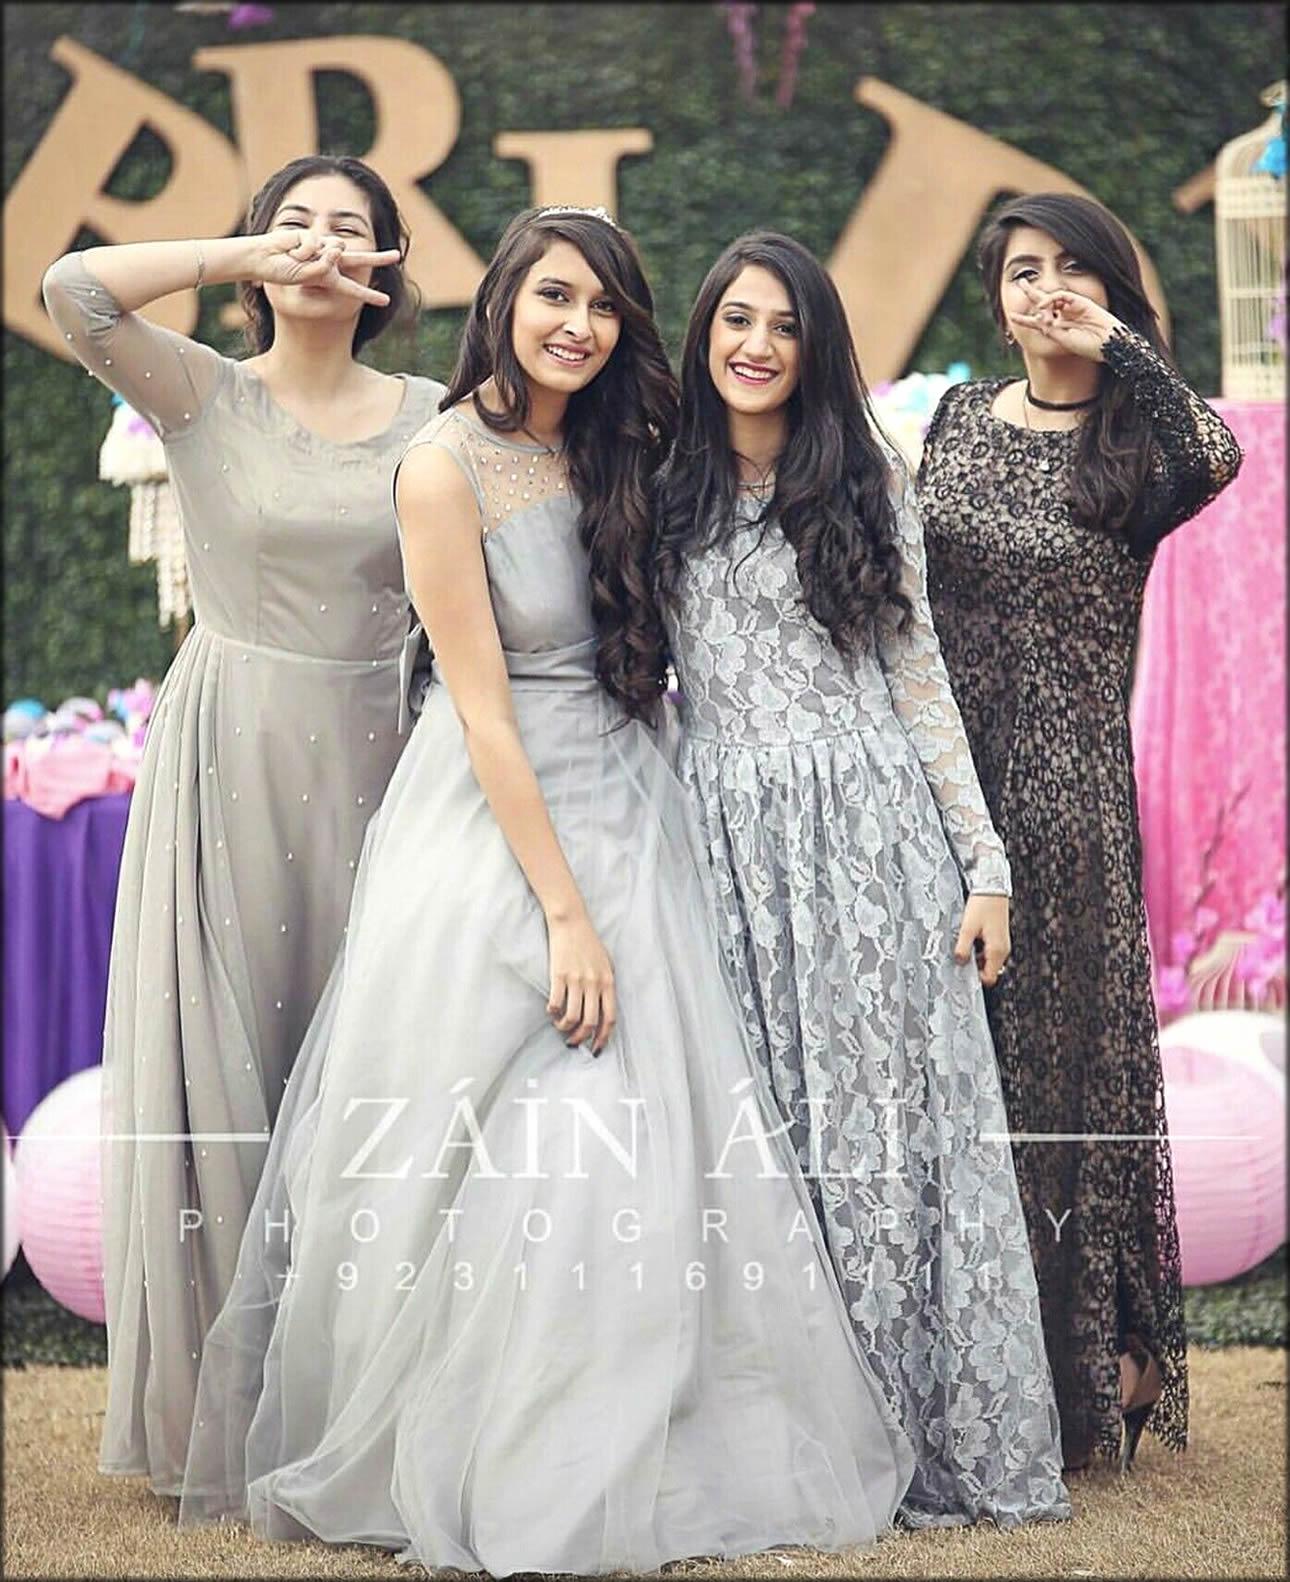 Bridal Shower Dresses For Bridemaids